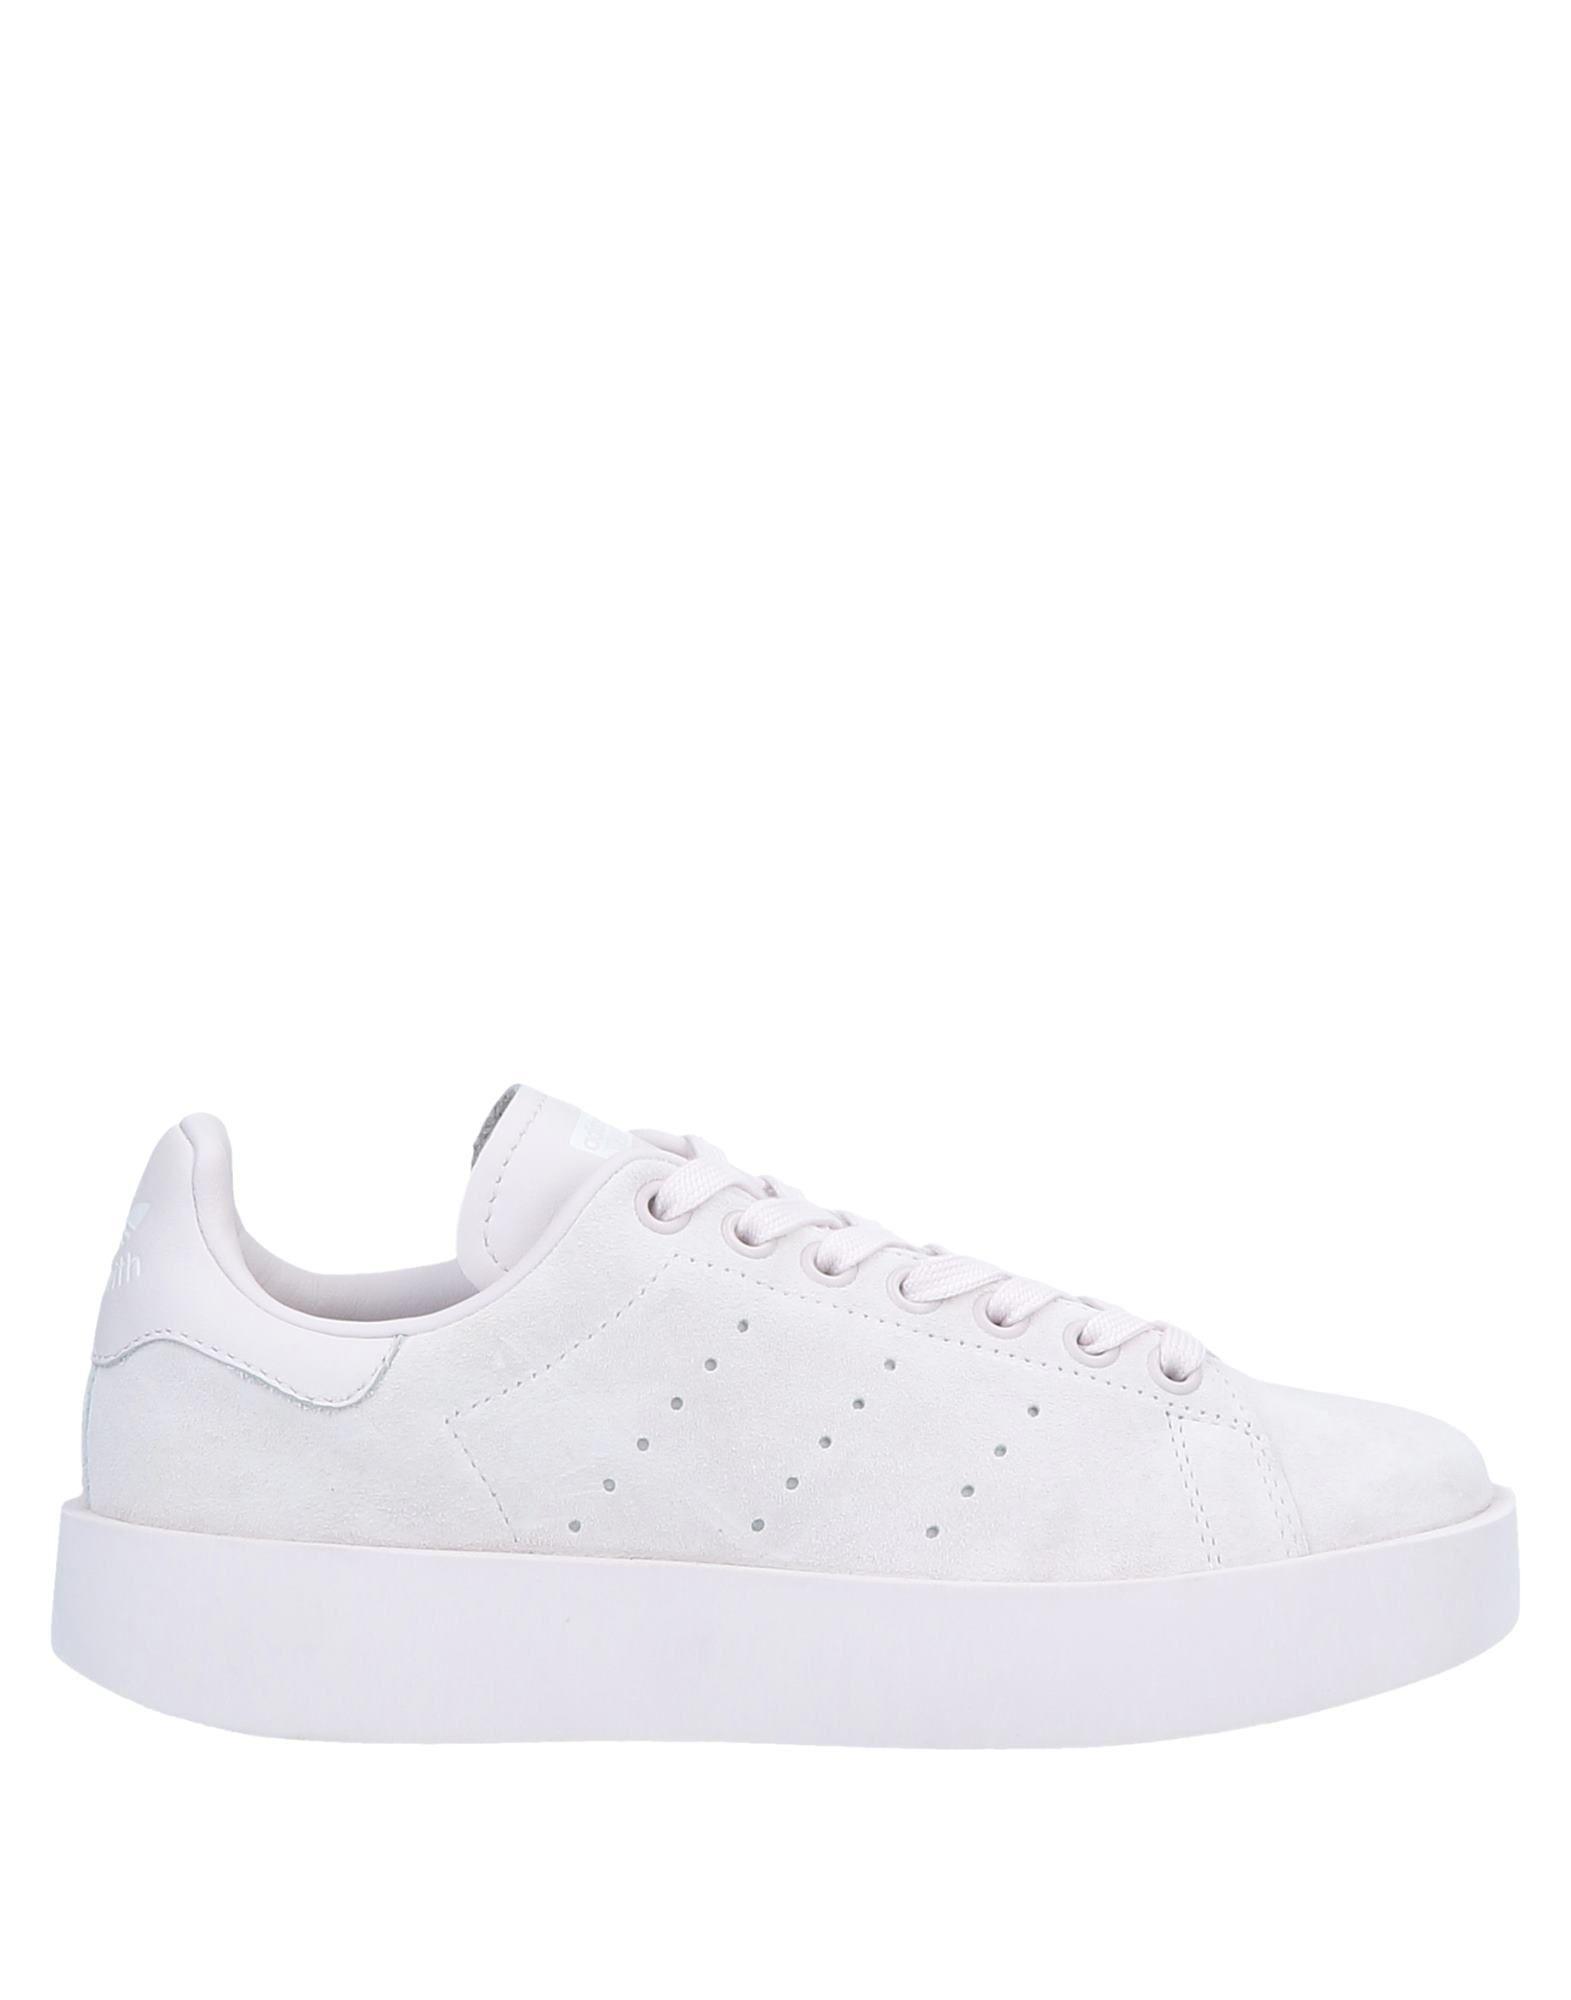 Adidas Originals Sneakers - Women Adidas Originals Sneakers online on 11563705SB  United Kingdom - 11563705SB on 6af26e